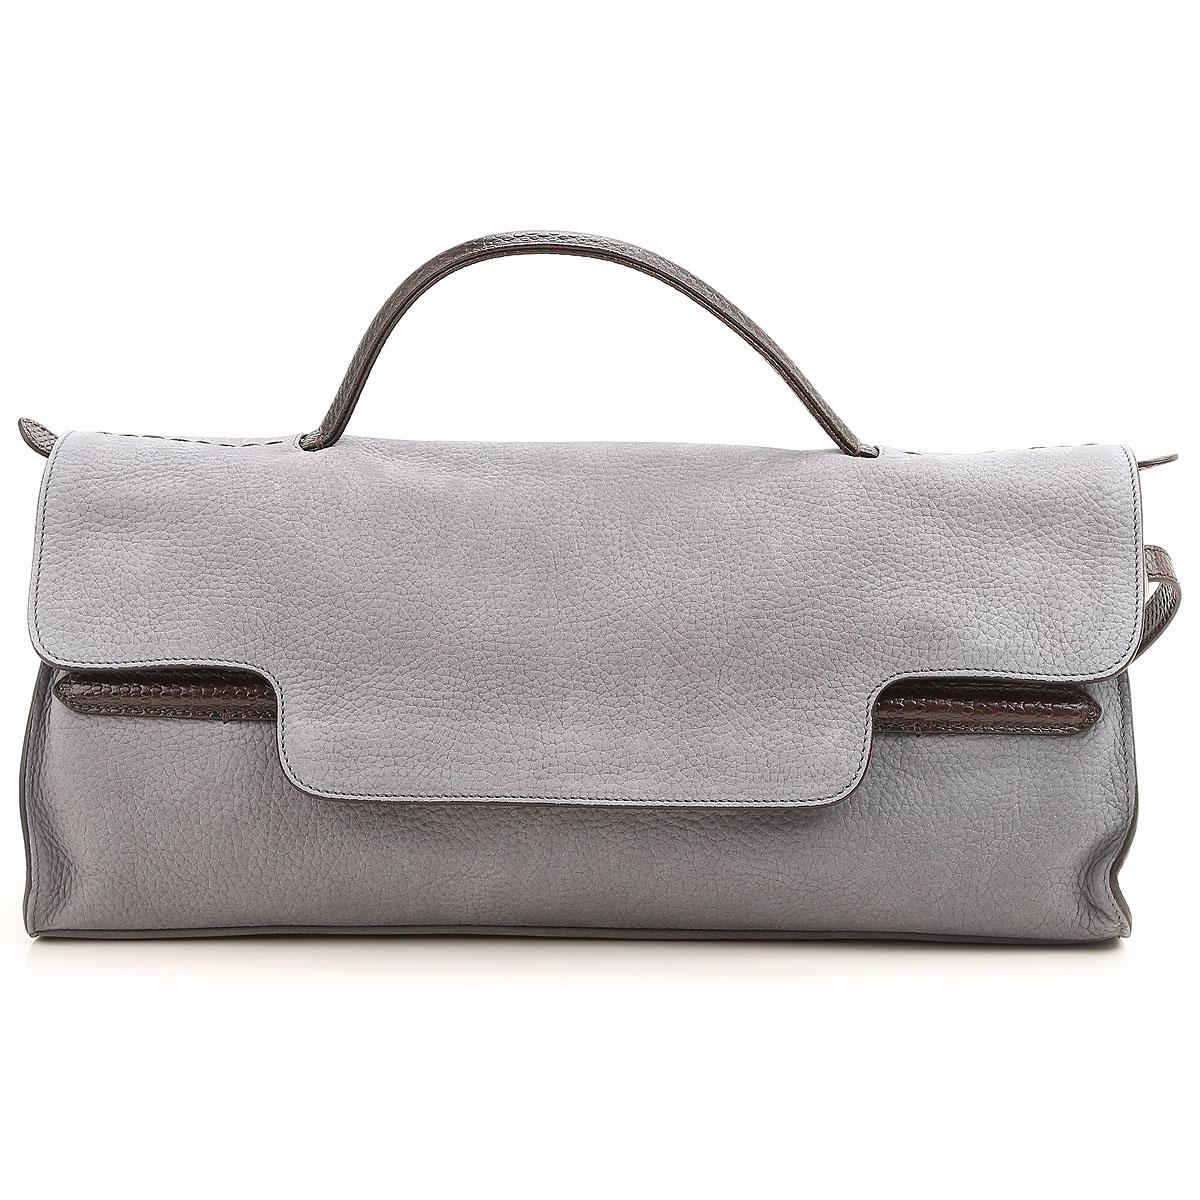 Top Handle Handbag On Sale, Nina L, Black, Leather, 2017, one size Zanellato